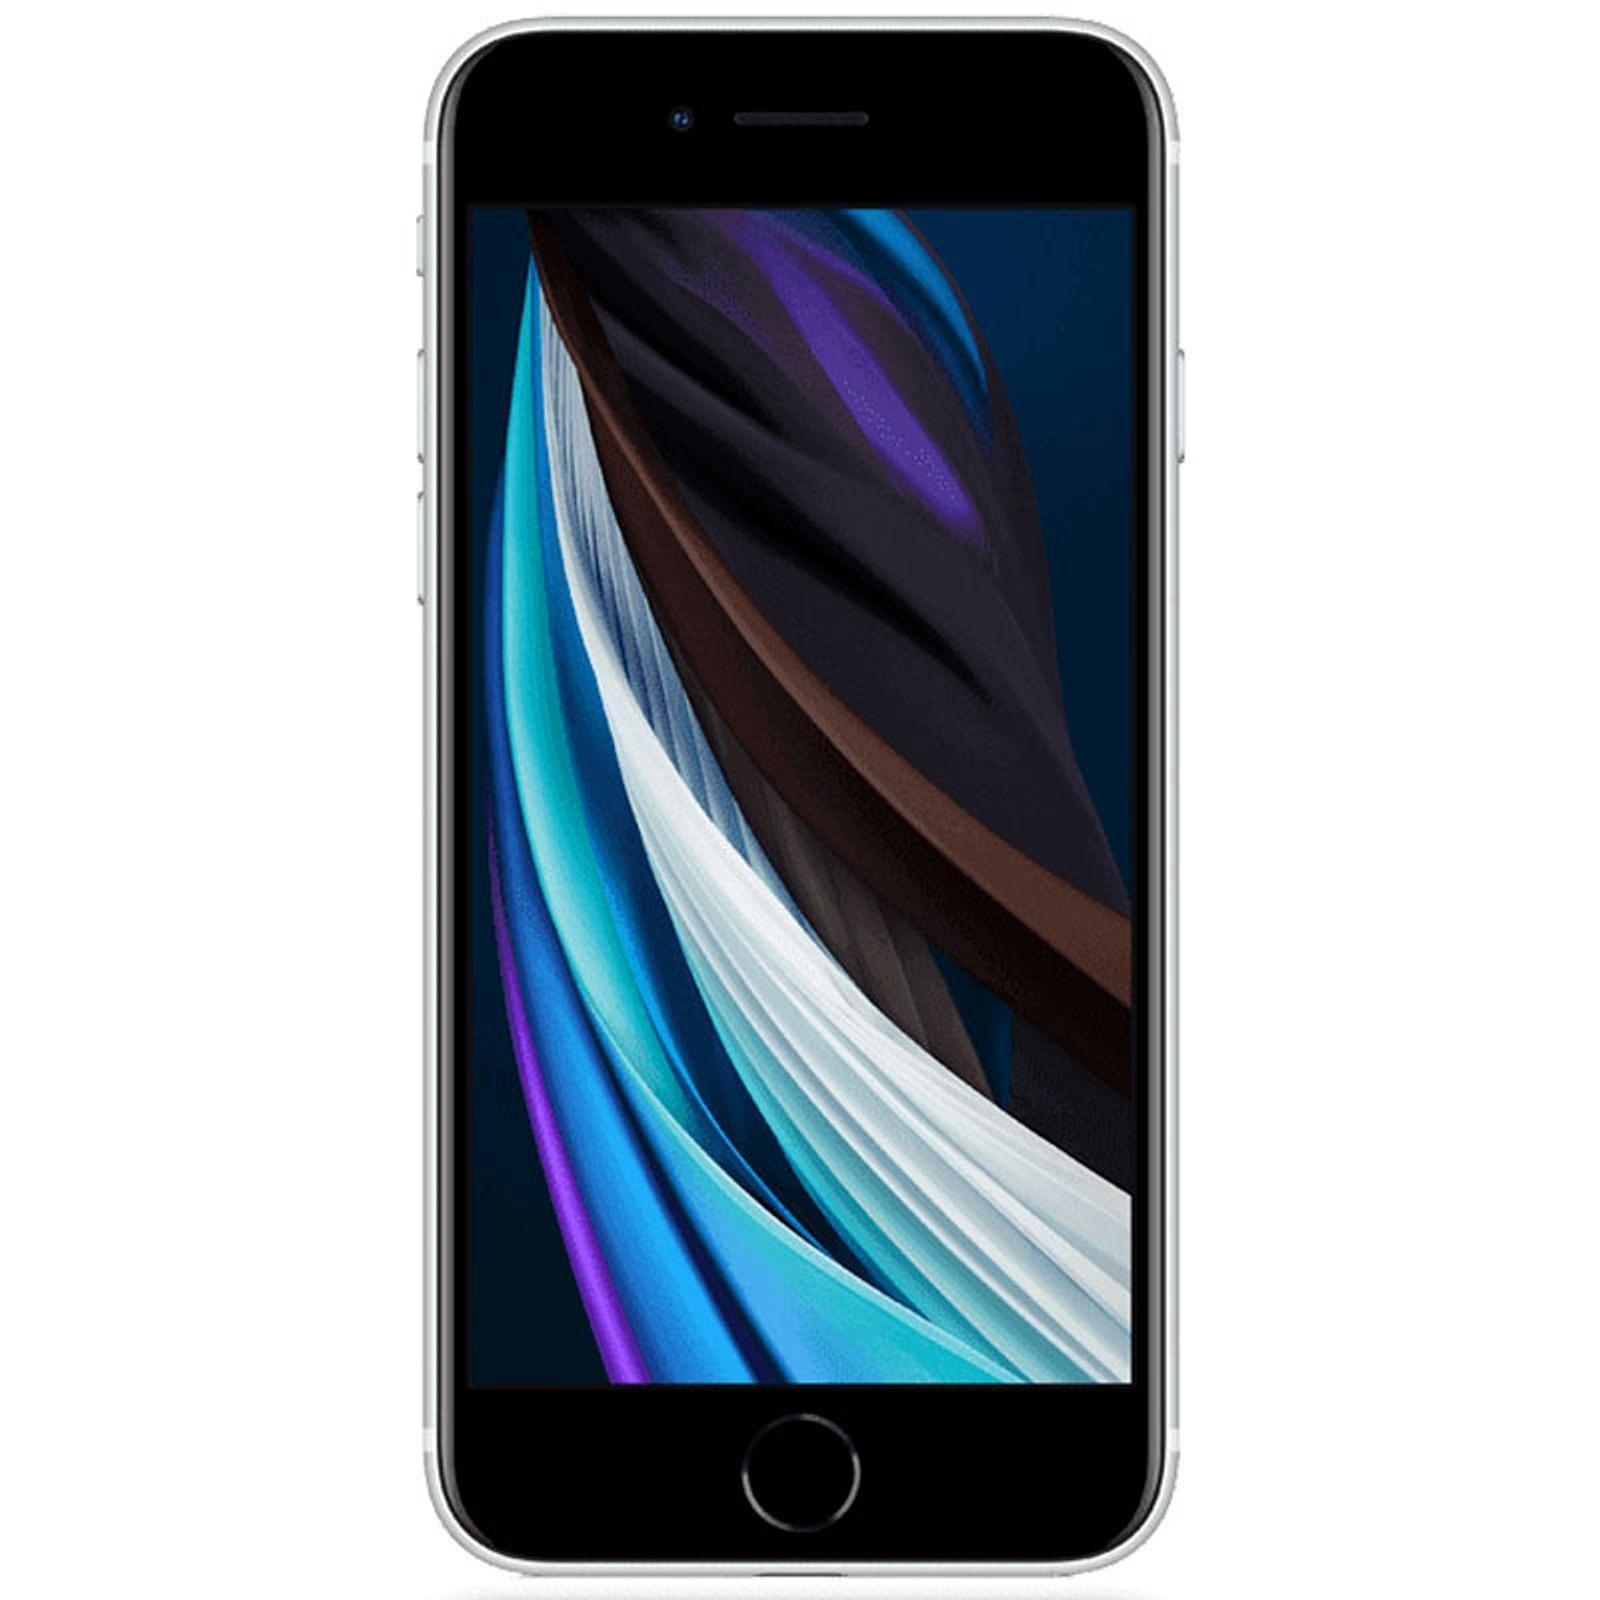 "Apple iPhone SE (2020) 64/3GB - A13 Prozessor (498K Antutu) - 4,7"" HD Ready - 1821mAh Akku | Media-Saturn"